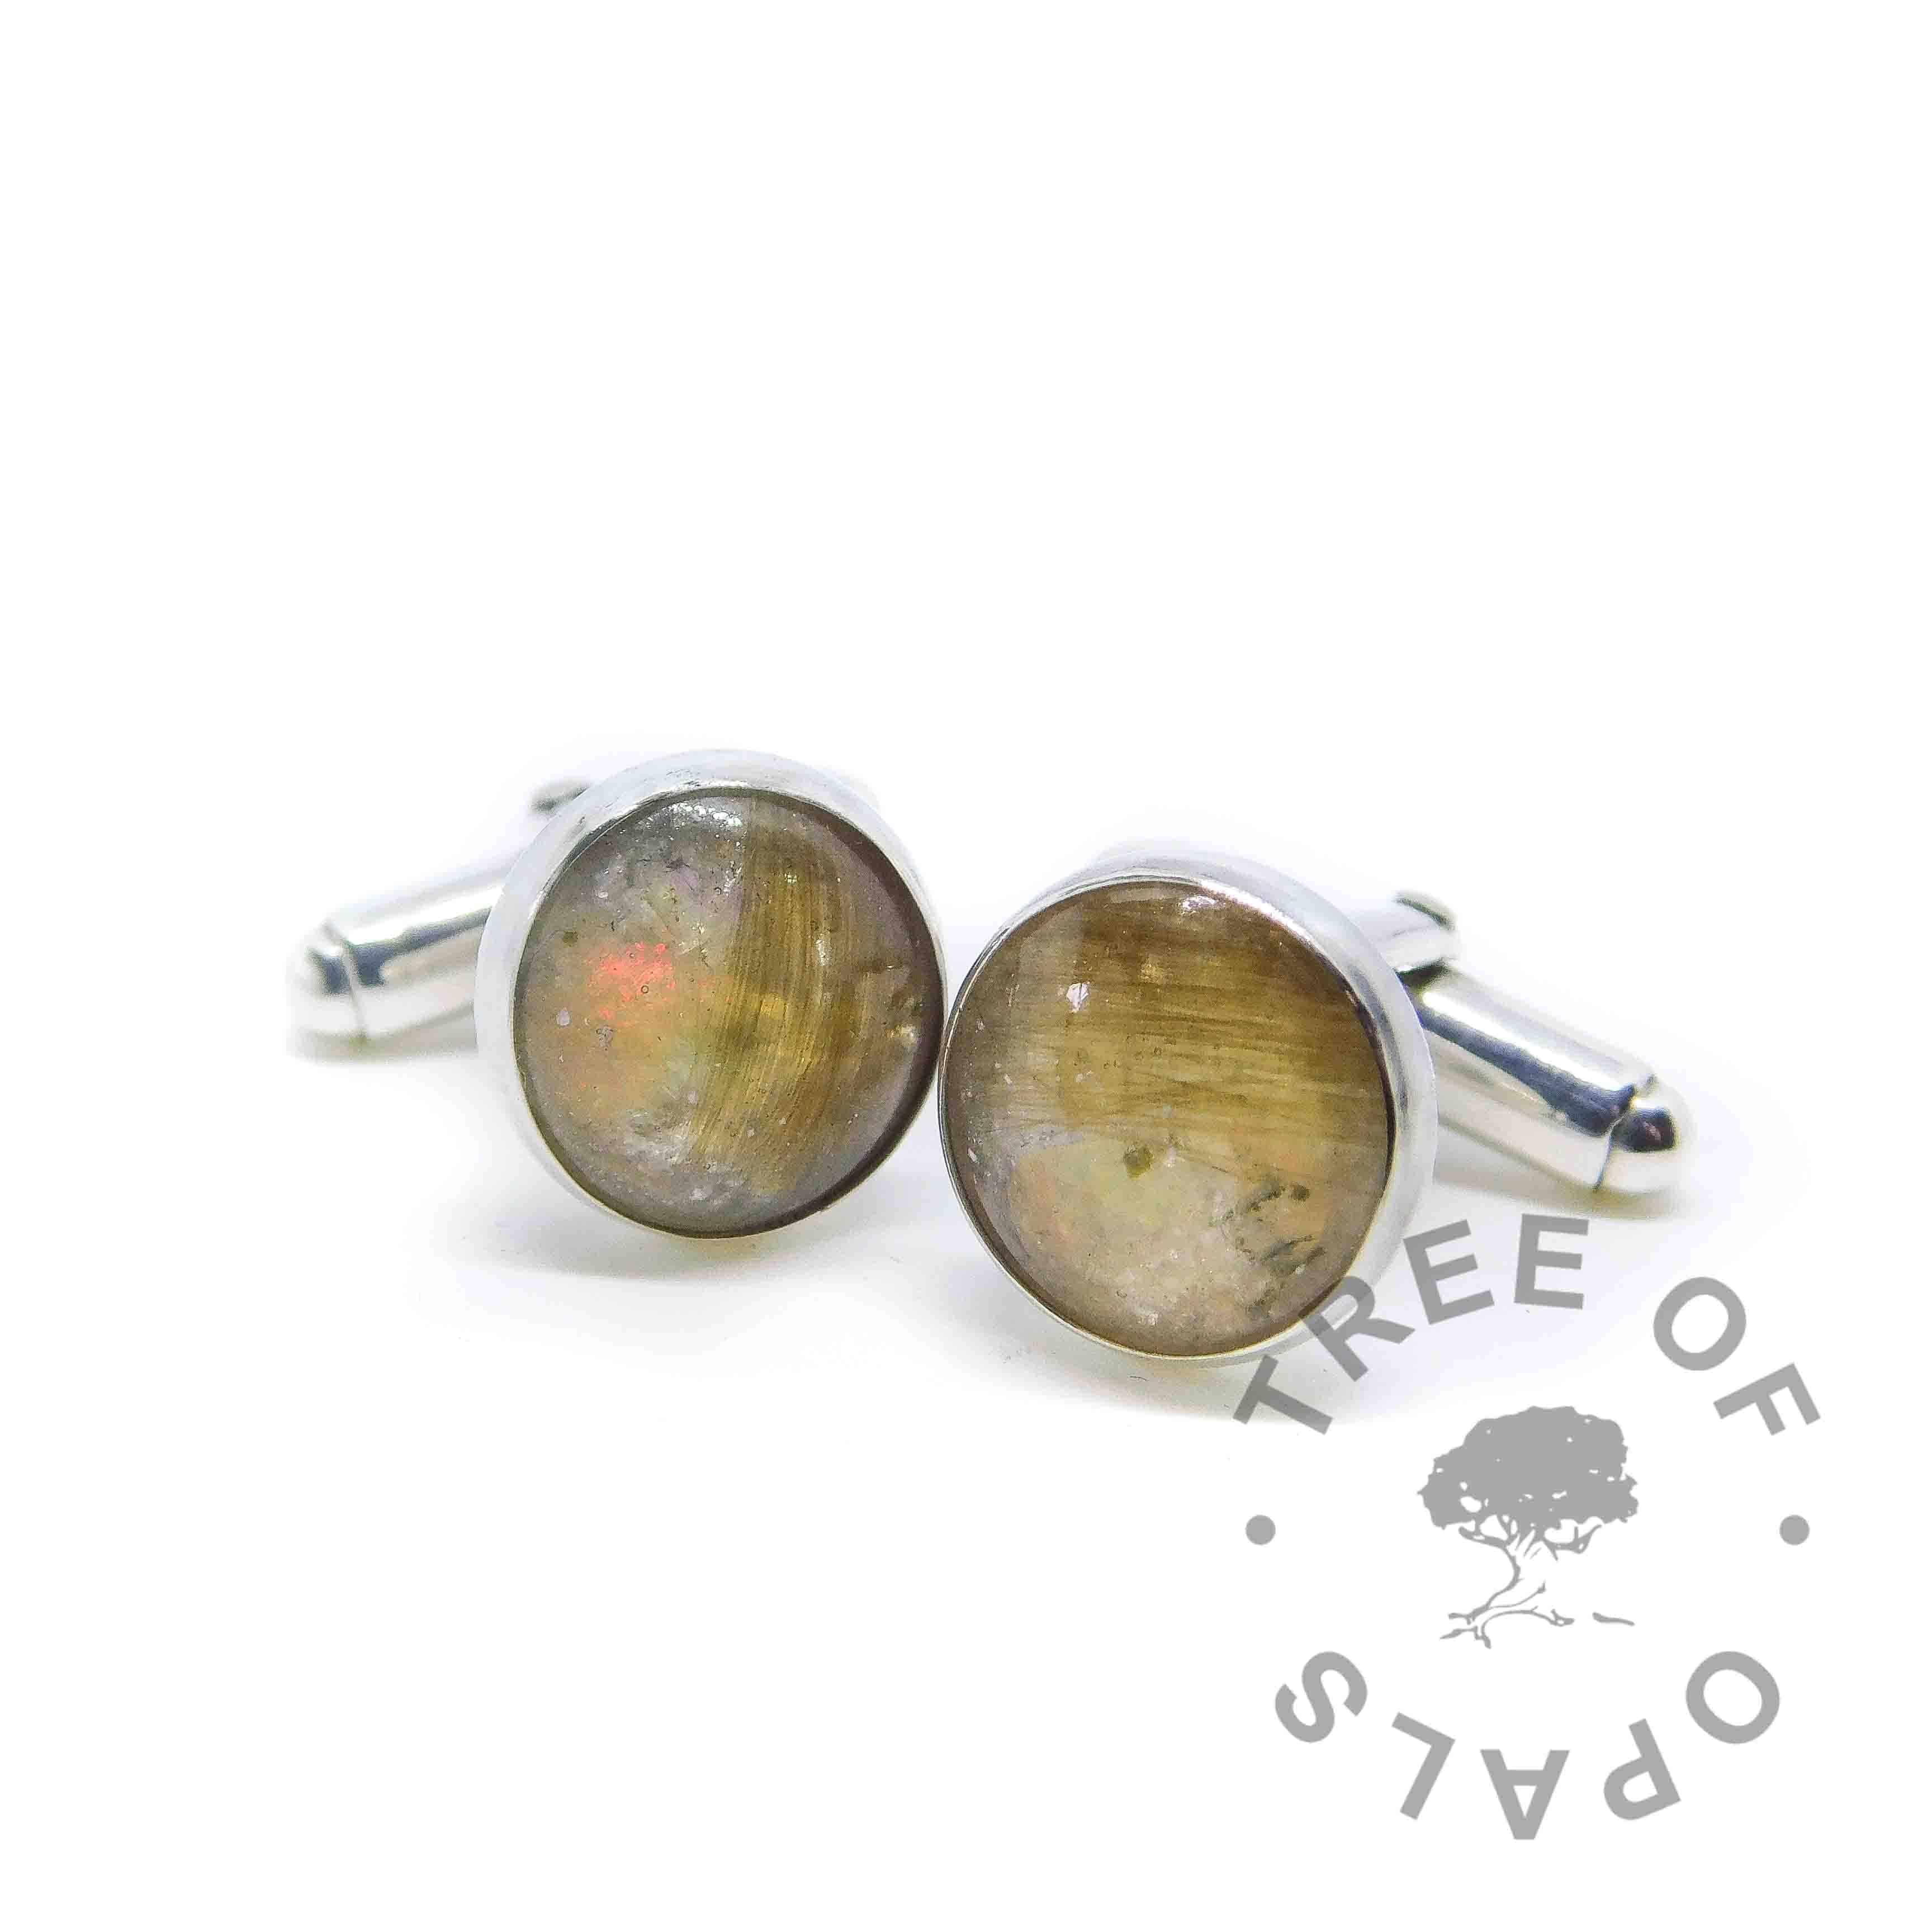 hair cufflinks opal October birthstone, handmade memorial cufflinks